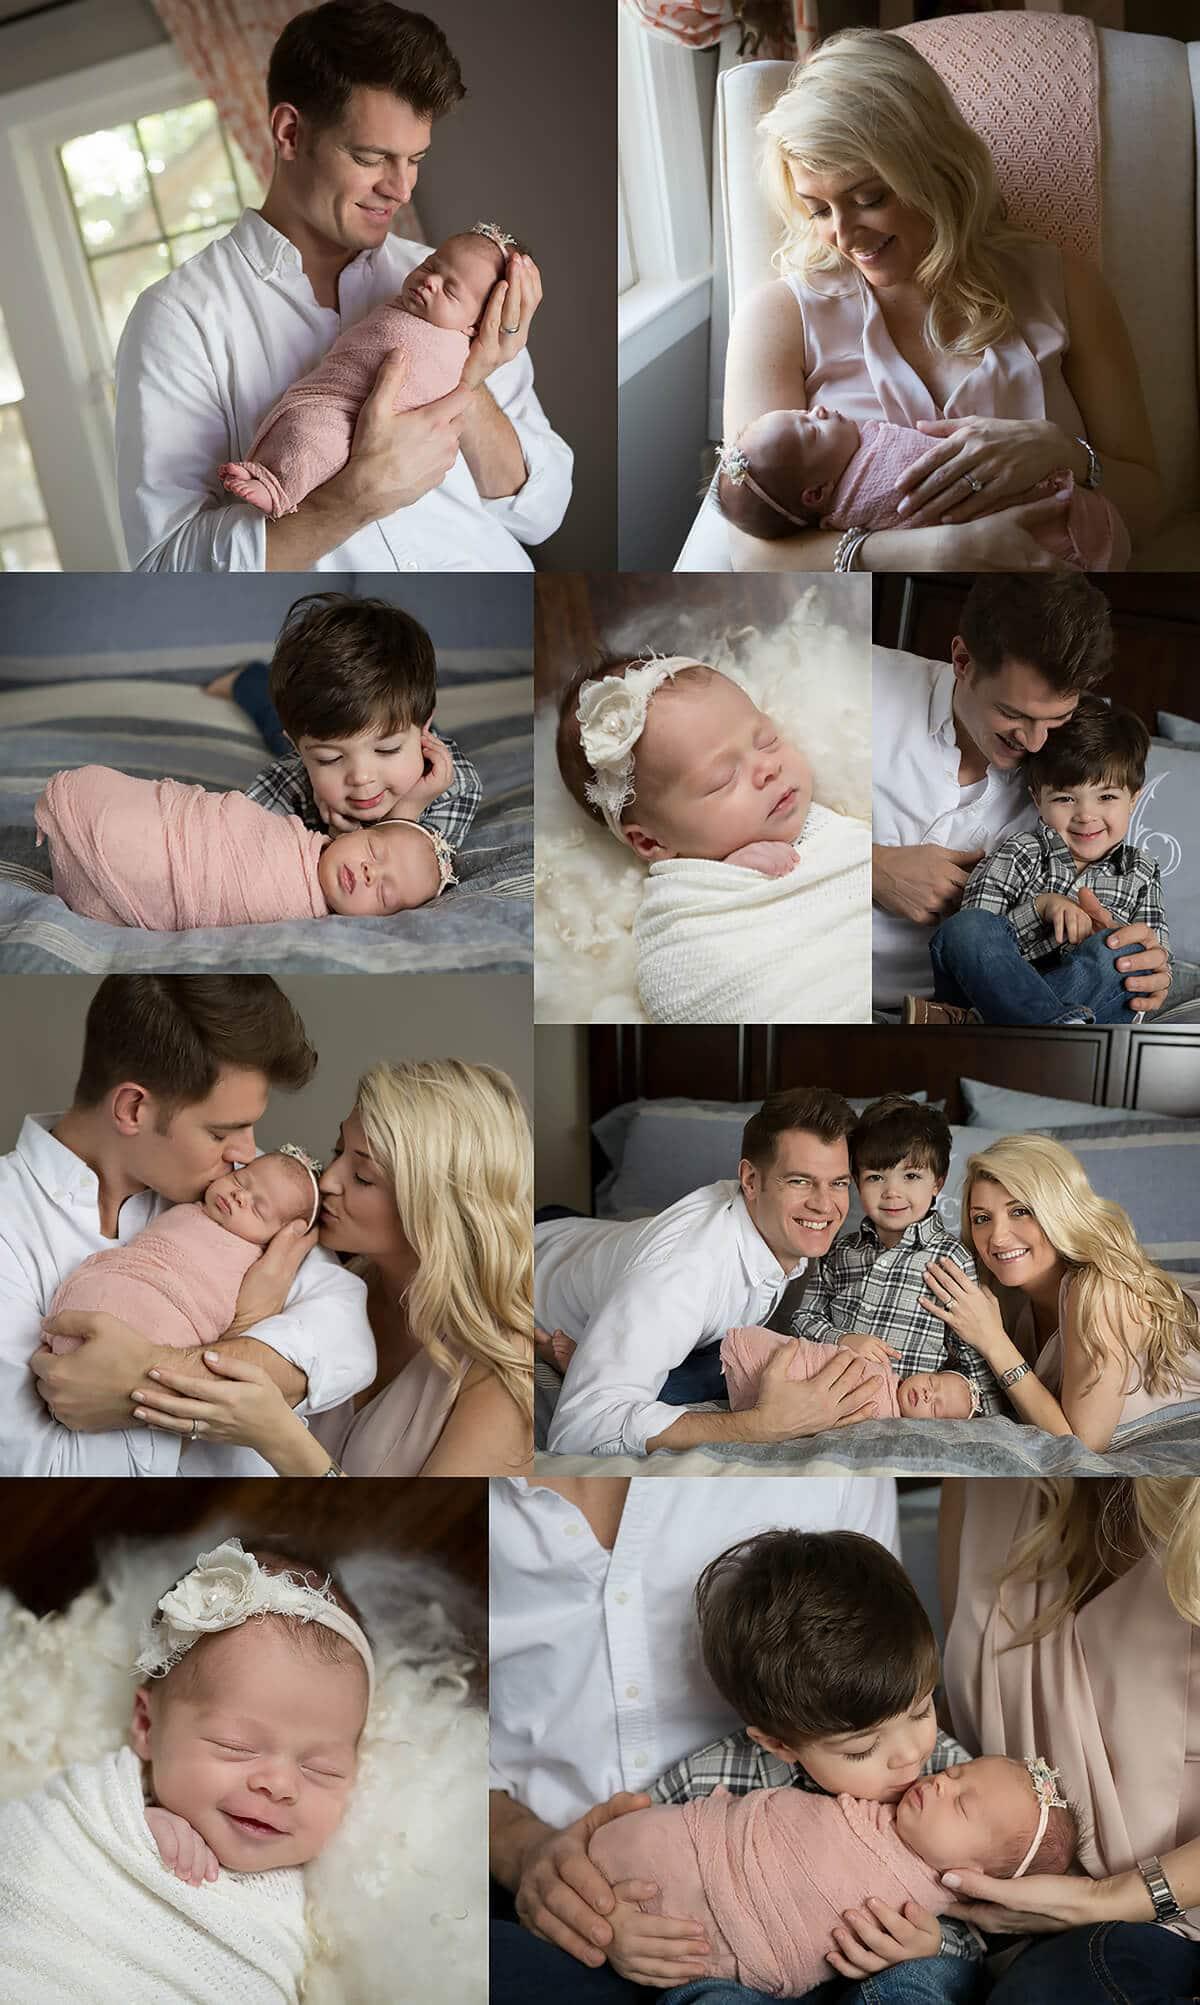 newborn baby girl session at home in San Antonio, Texas blush, cream, white